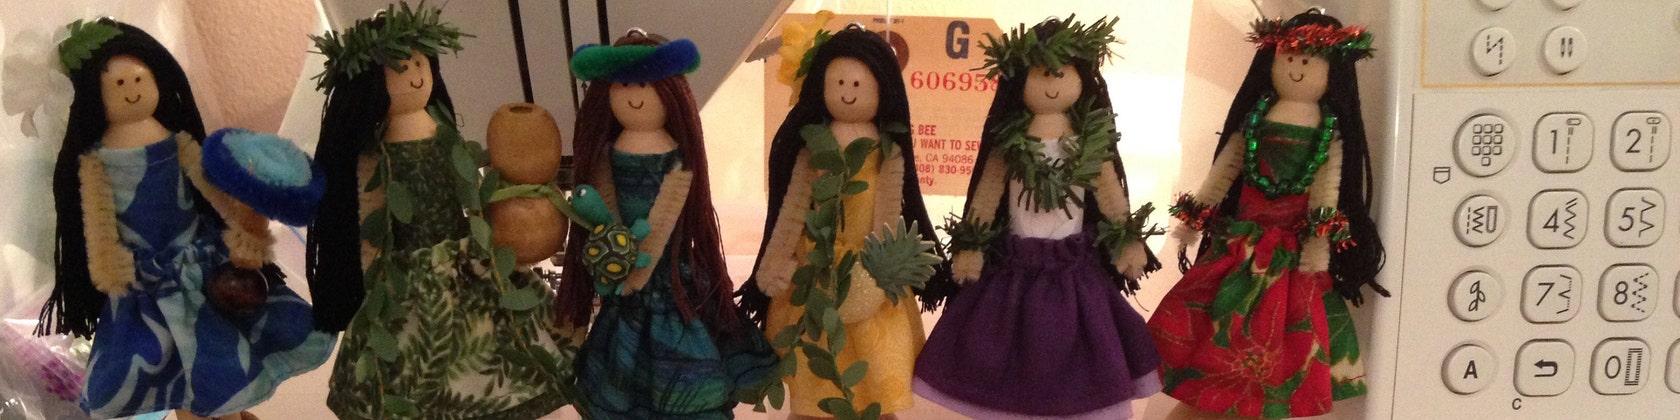 0434b8ae888f1 Hawaiian Christmas Ornaments von kalenadesign auf Etsy